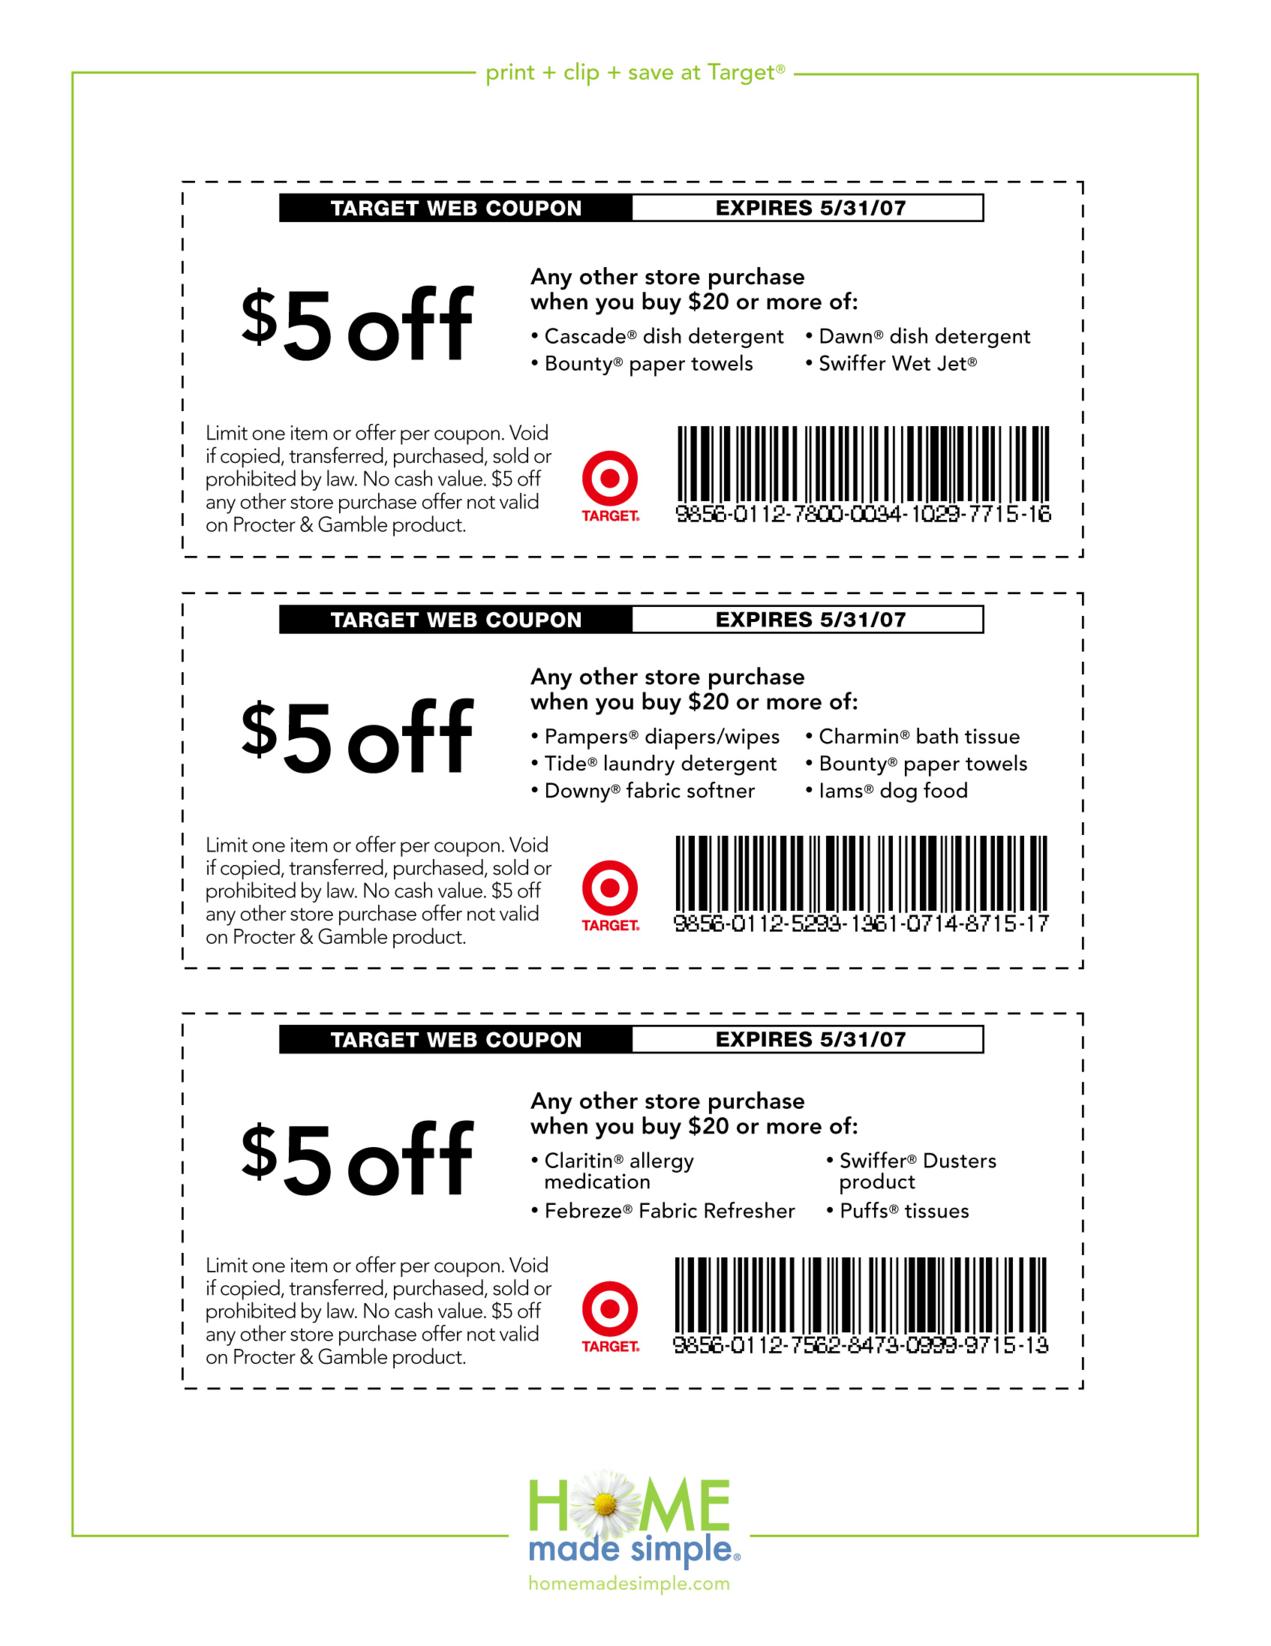 5-Off-Free-Printable-Coupons-Target - Free Printable Coupons 2017